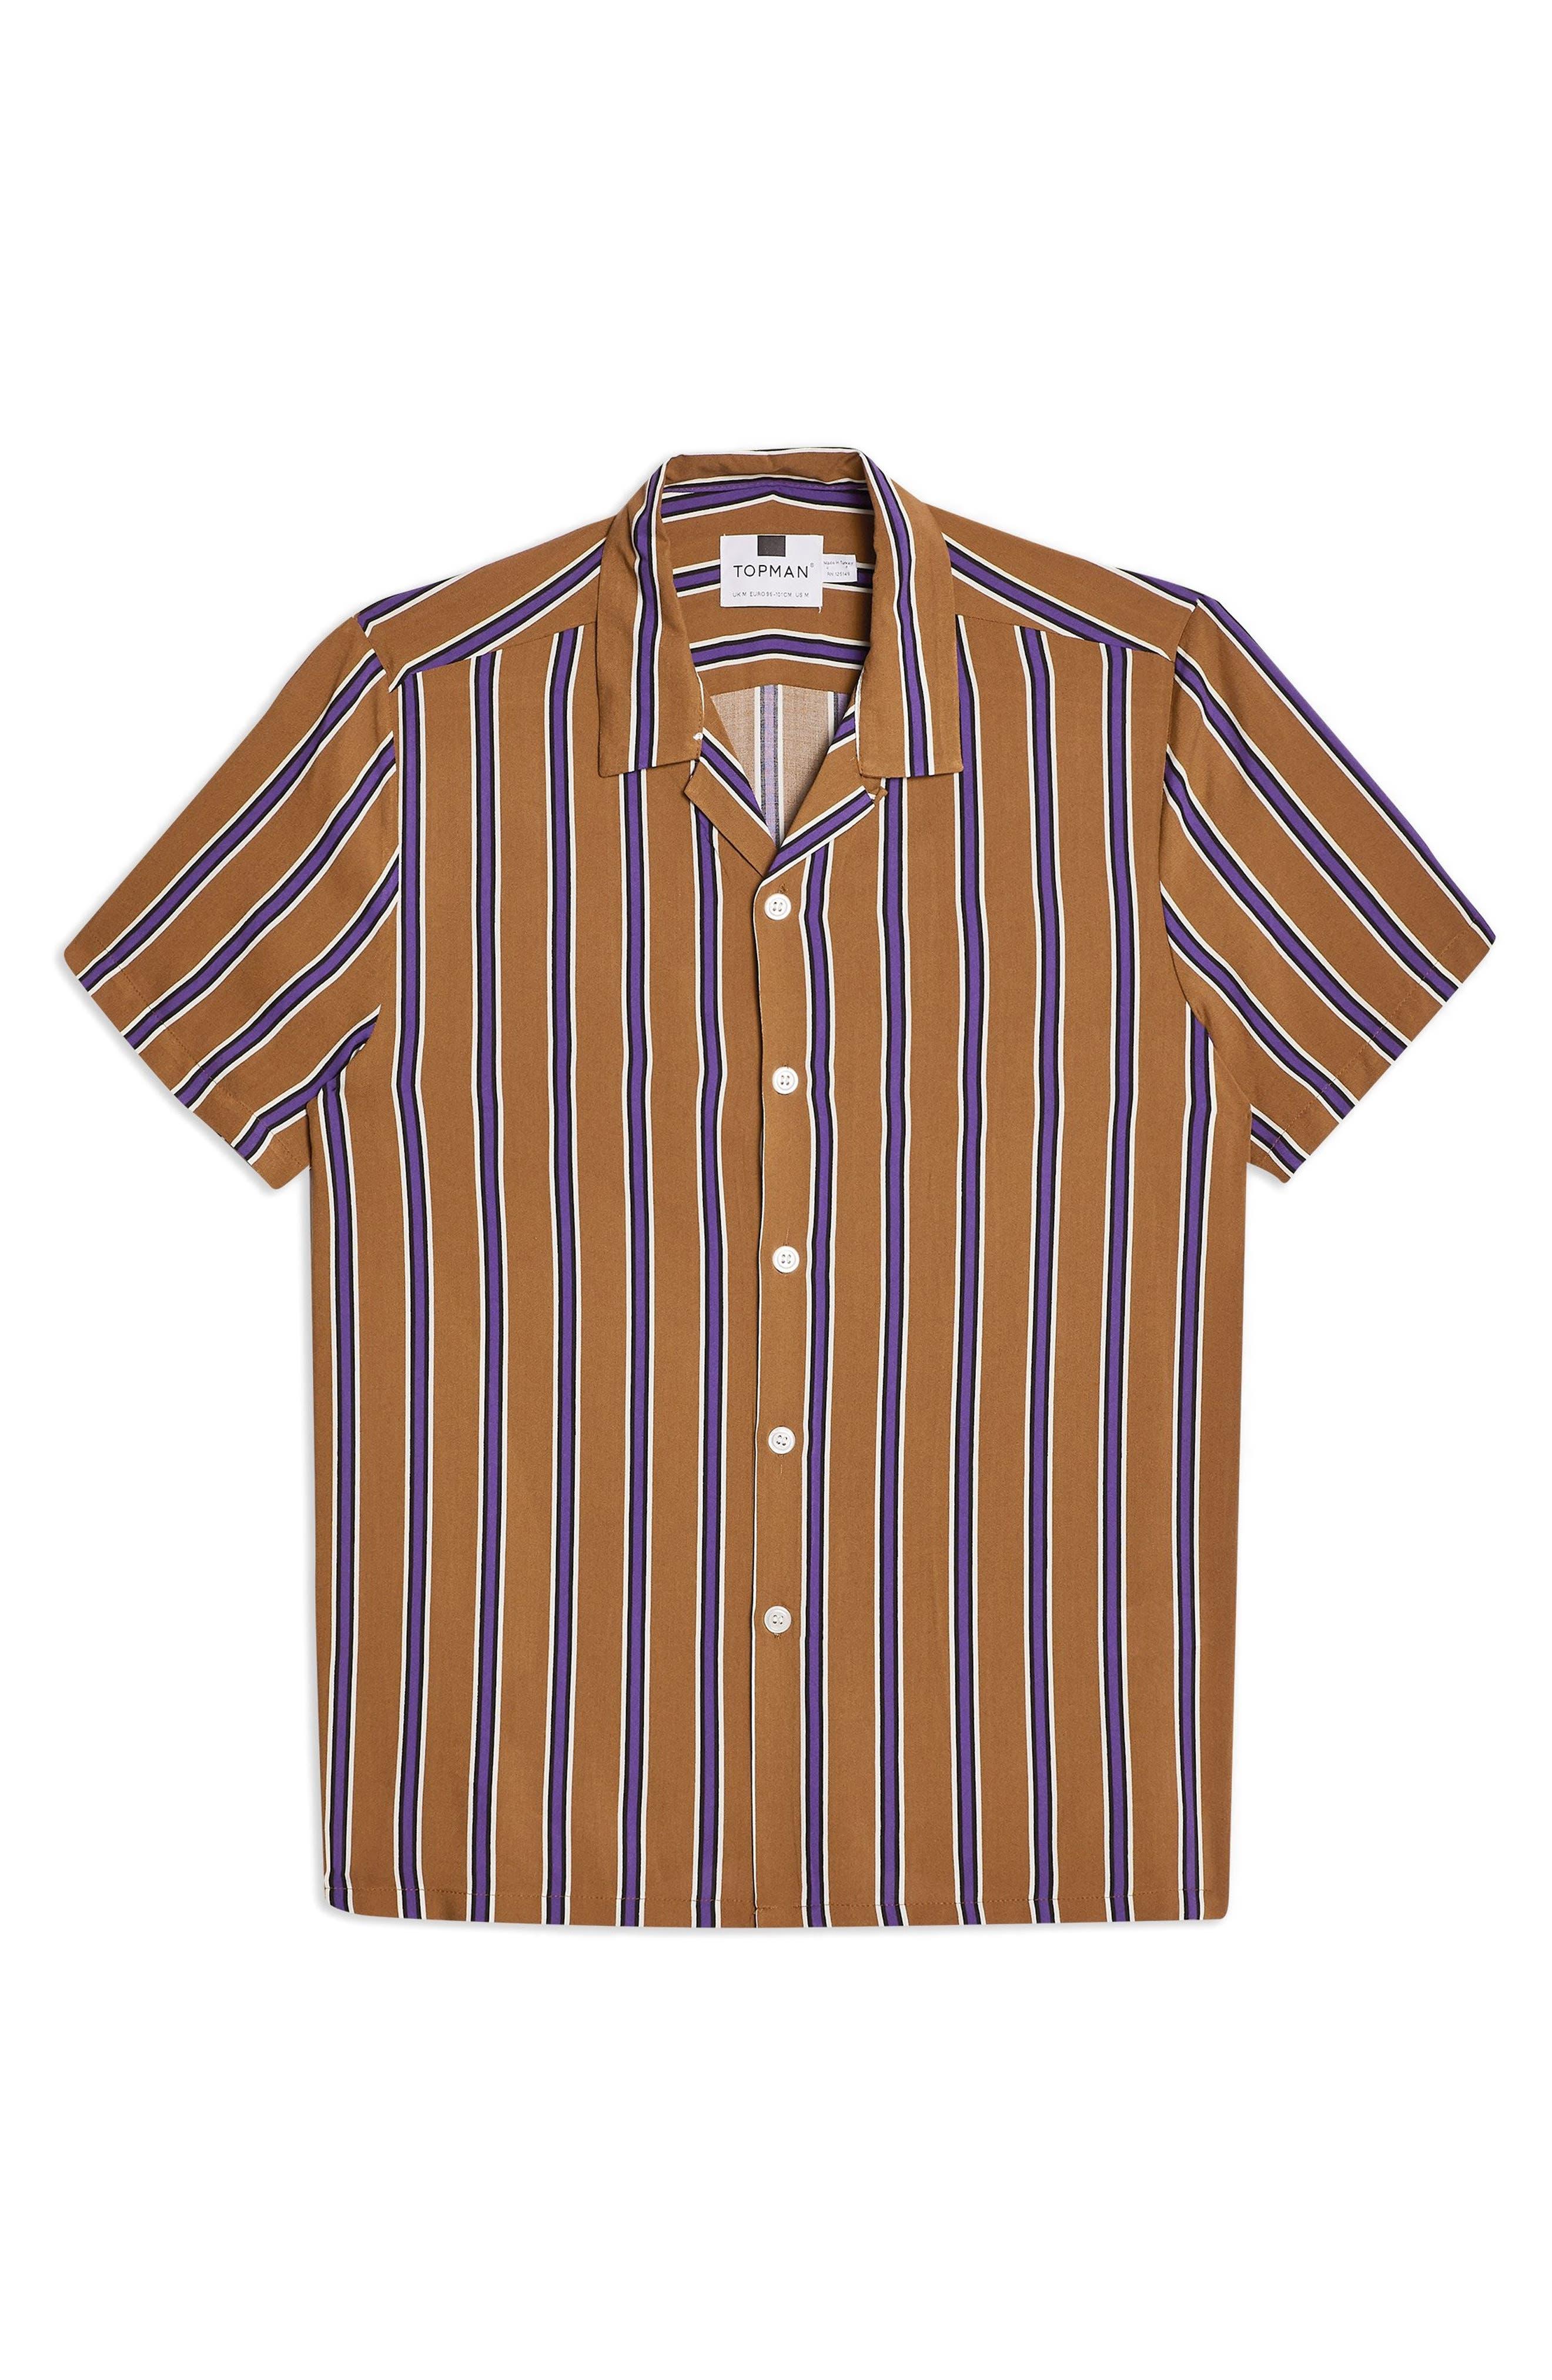 TOPMAN,                             Stripe Revere Collar Camp Shirt,                             Alternate thumbnail 4, color,                             BROWN MULTI